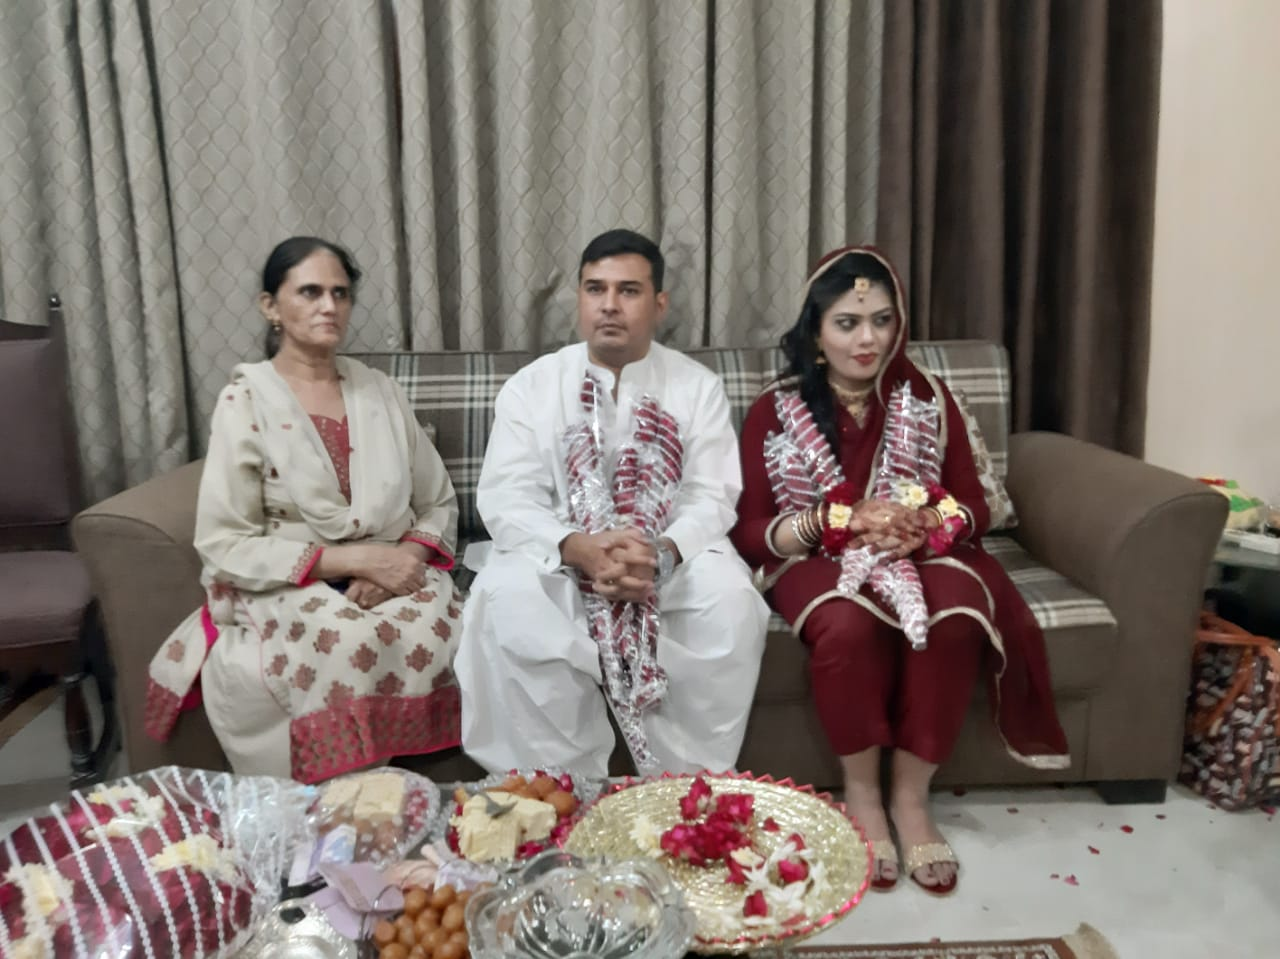 Mrs. Rudaba Irshad with Kamran and Bushra